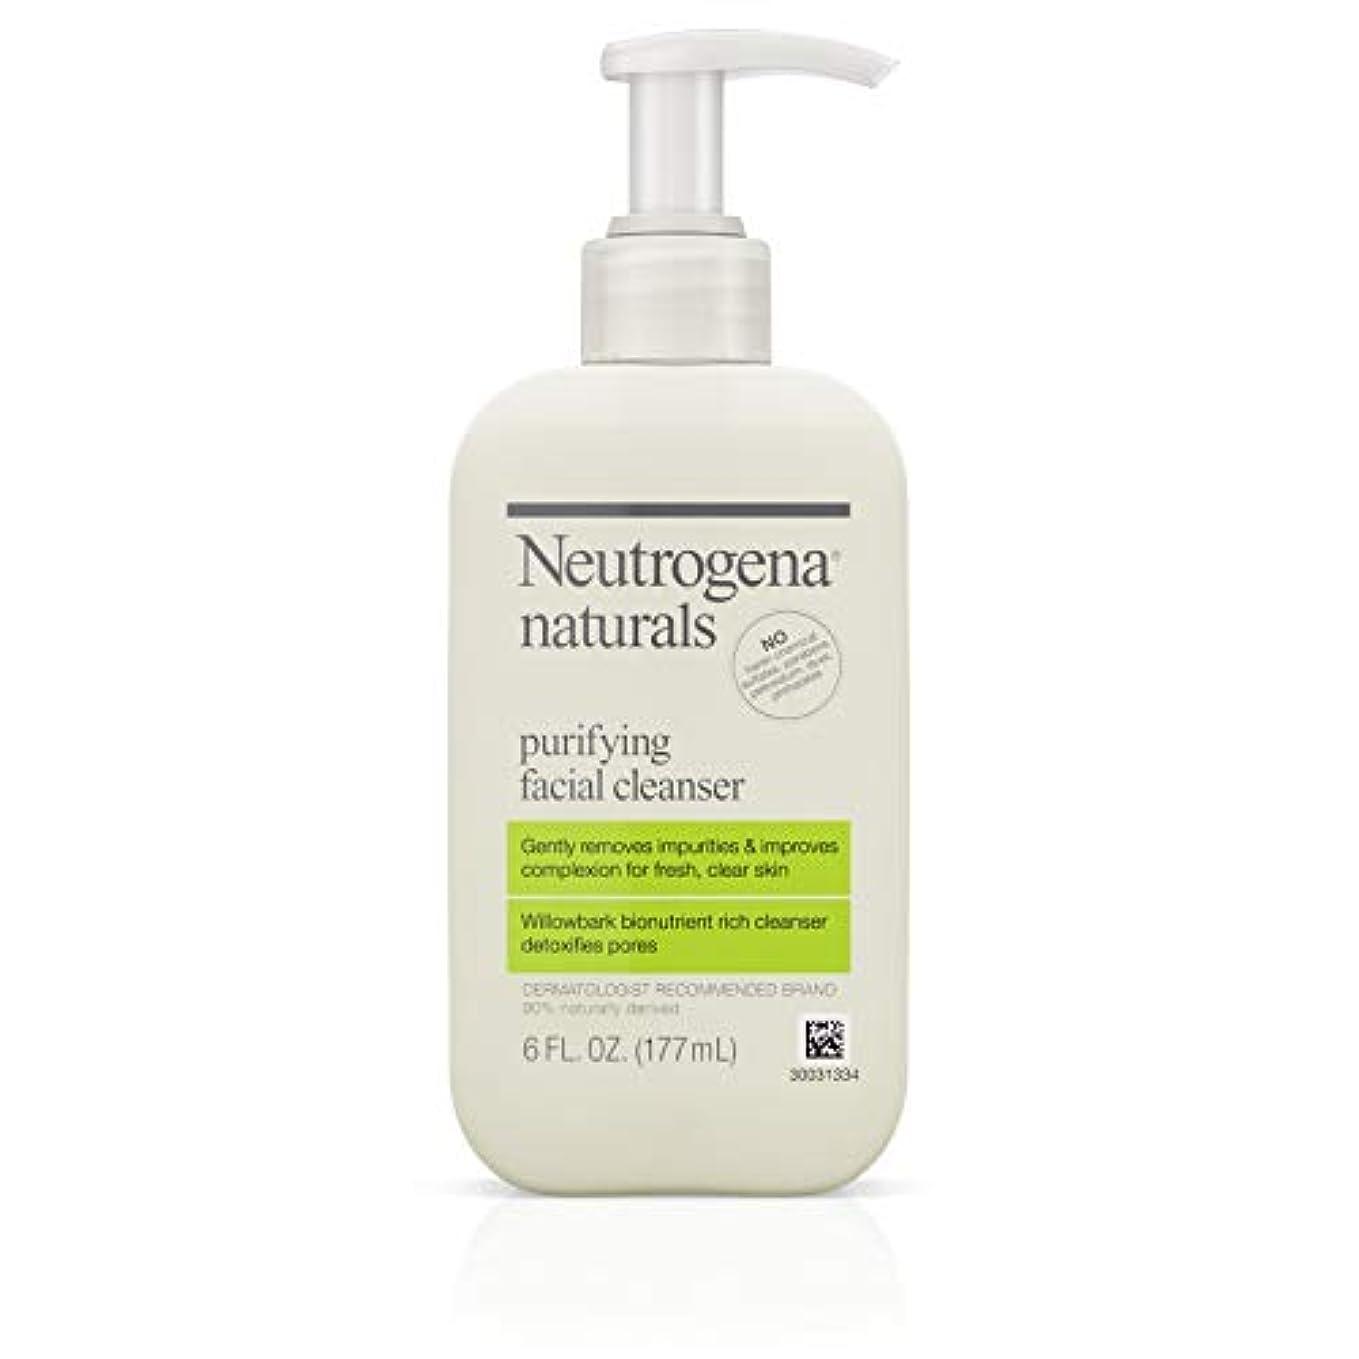 Neutrogena Naturals Purifying Facial Cleanser 175 ml (並行輸入品)